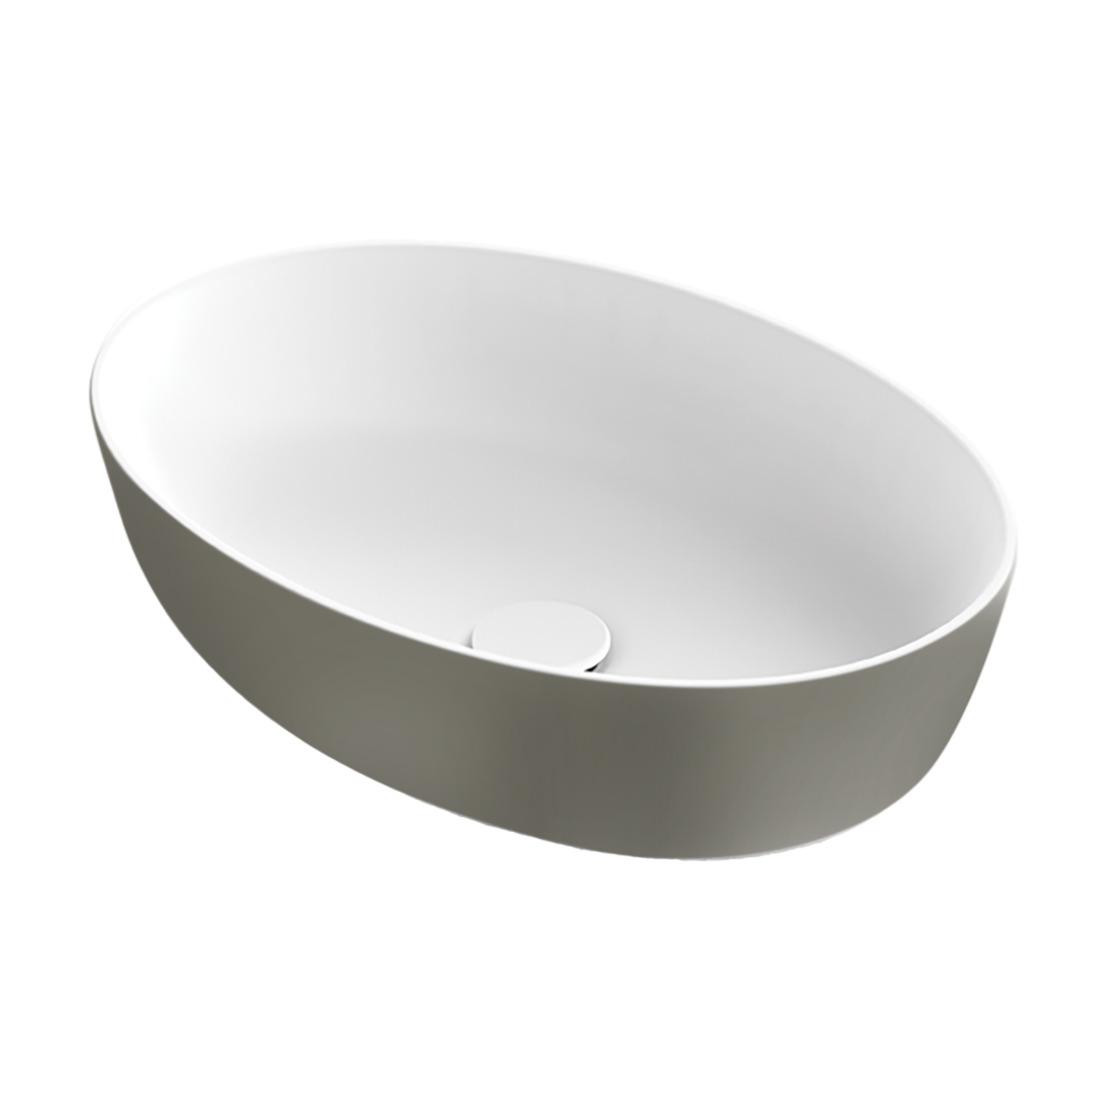 Xenz Neo-E waskom ovaal solid surface wit grijs